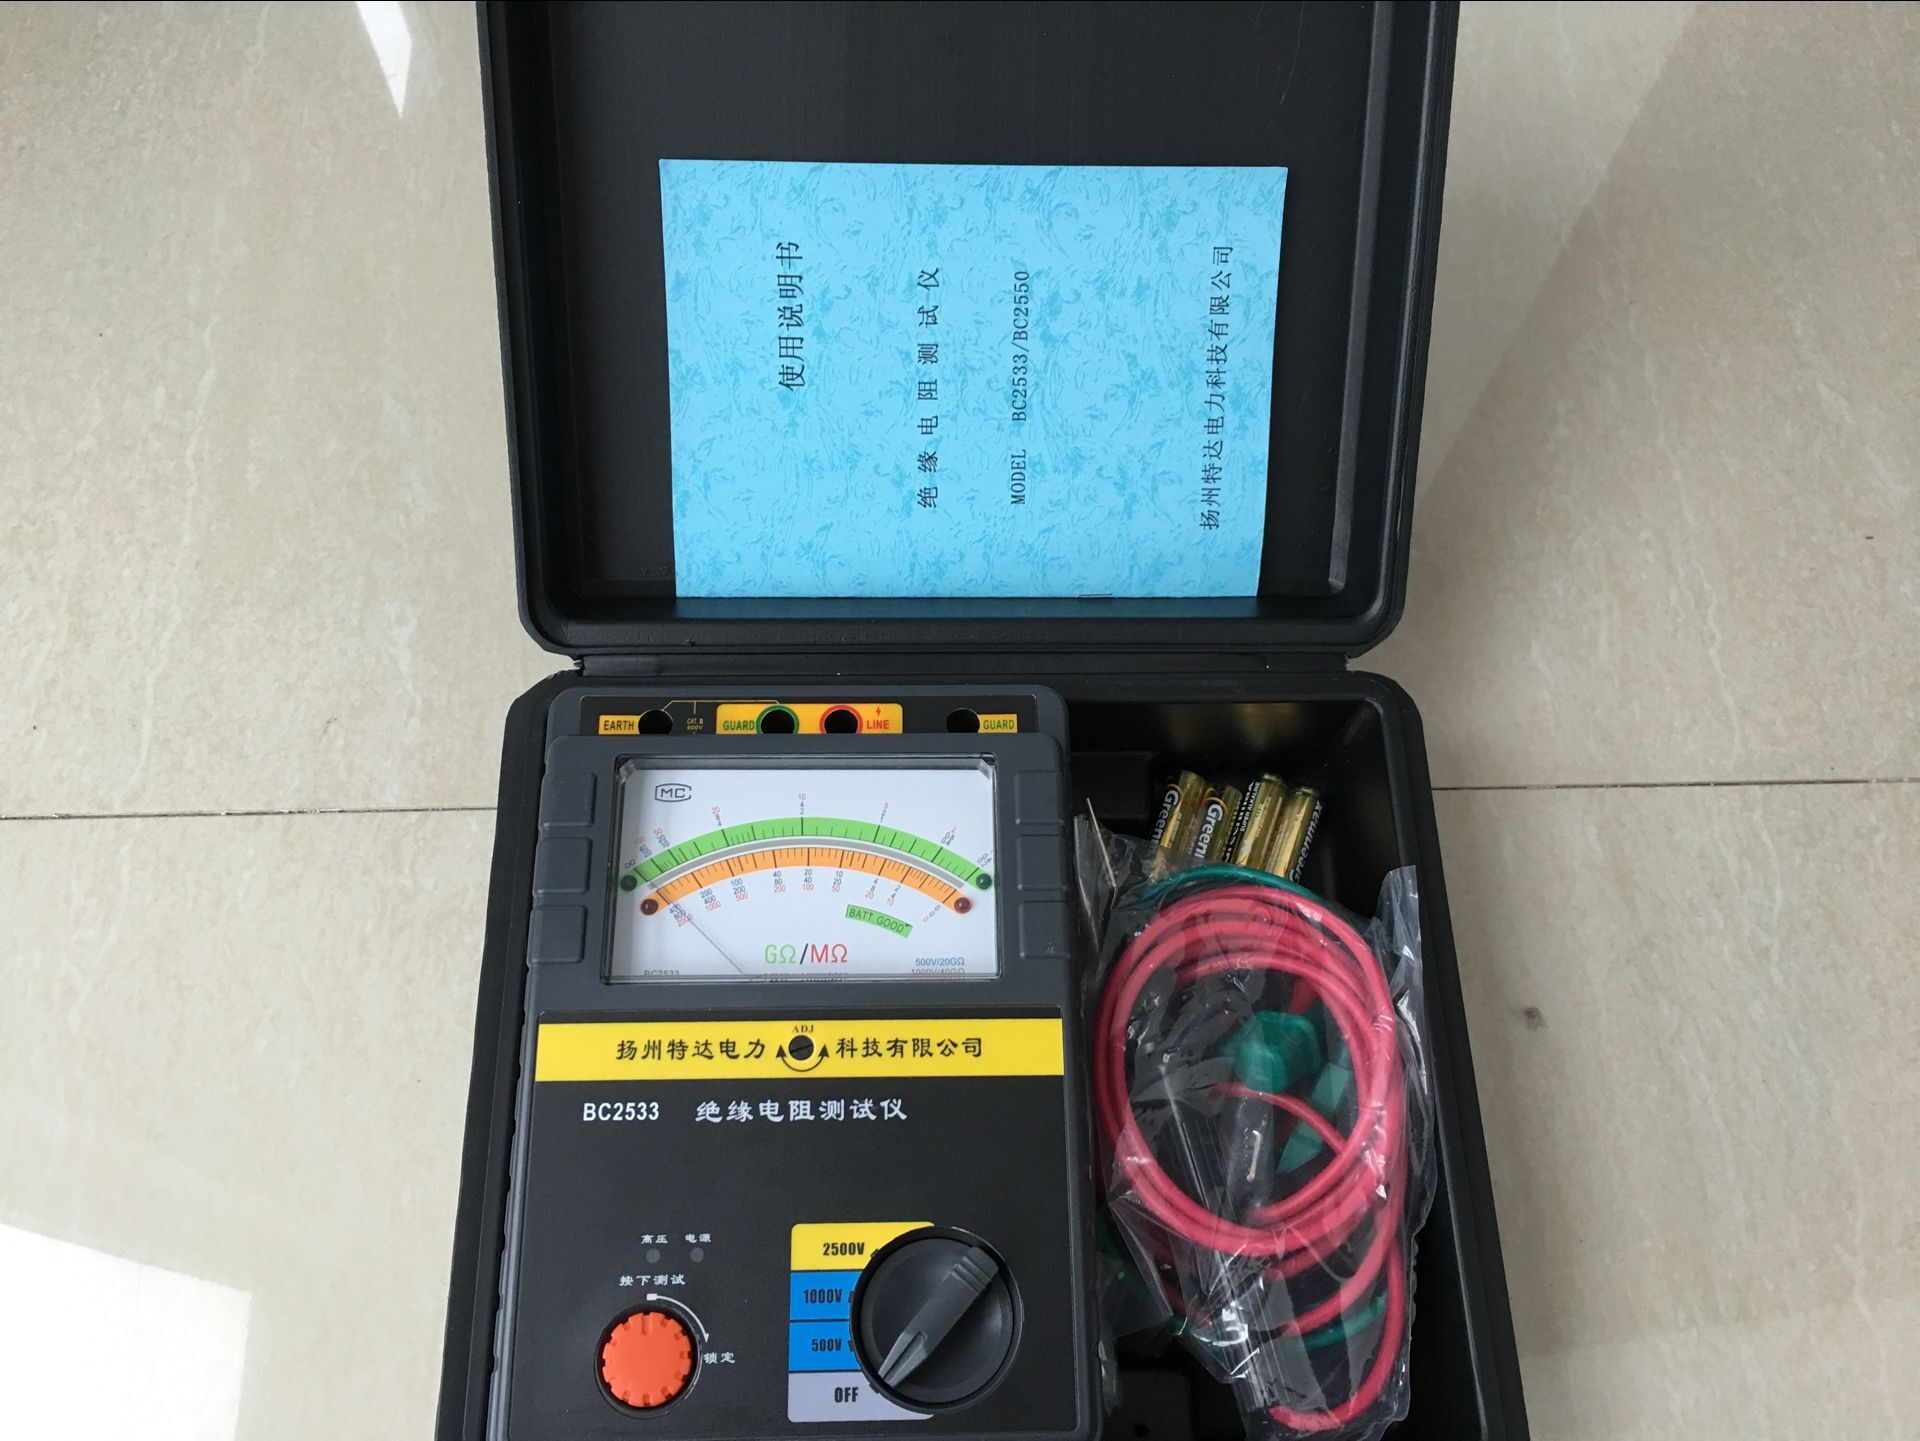 TD2533型绝缘电阻测试仪TD2533型在500V最高可测20G,1000V最高可测40G, 在2500V最高可测100G; 2、额定的输出电压保持在TD2533型为4M/8M/20M,这使得仪表能够精确测量较低的绝缘阻抗。 3、自动转换的高低范围双刻度指示, 彩色刻度易于读识, 并且有LED显示相应色彩。 4、整机采用ABS塑料机壳便携式设计,具有抗干扰能力强、结构紧凑.